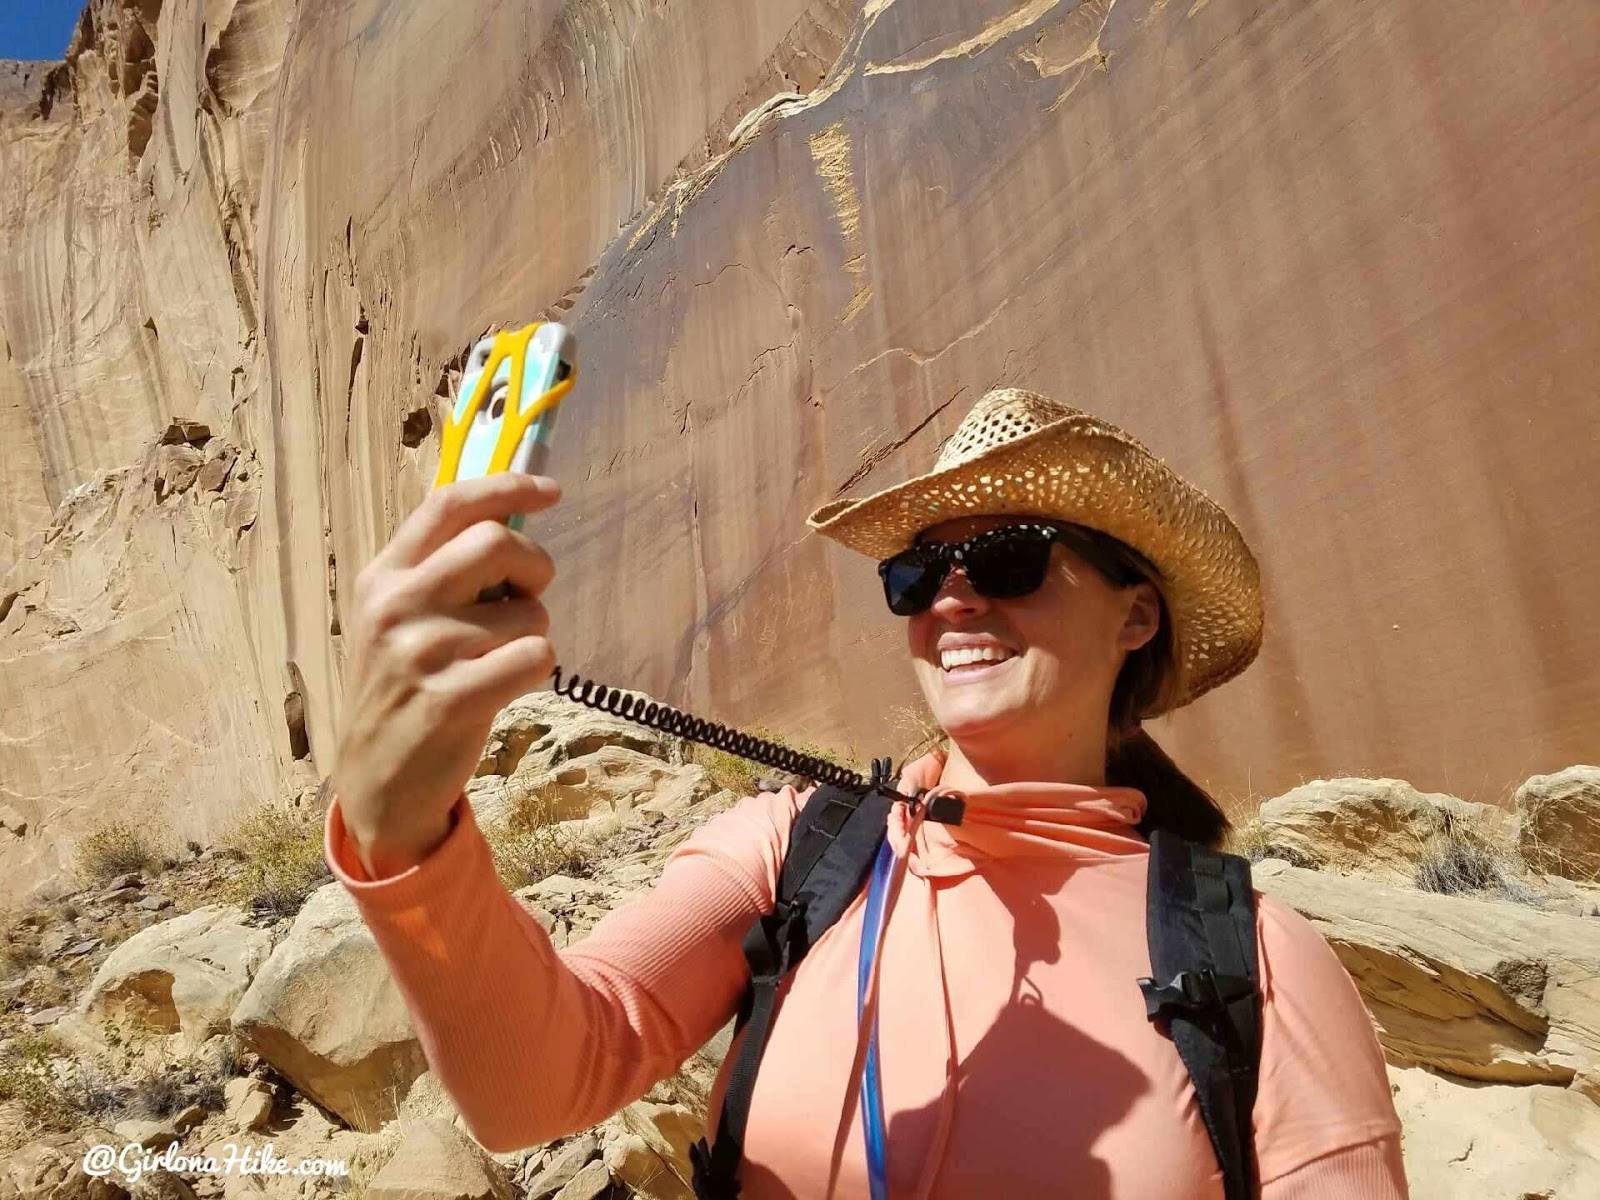 Gear Review: KOALA Hangtime Gear, The Ultimate Smart Phone Leash